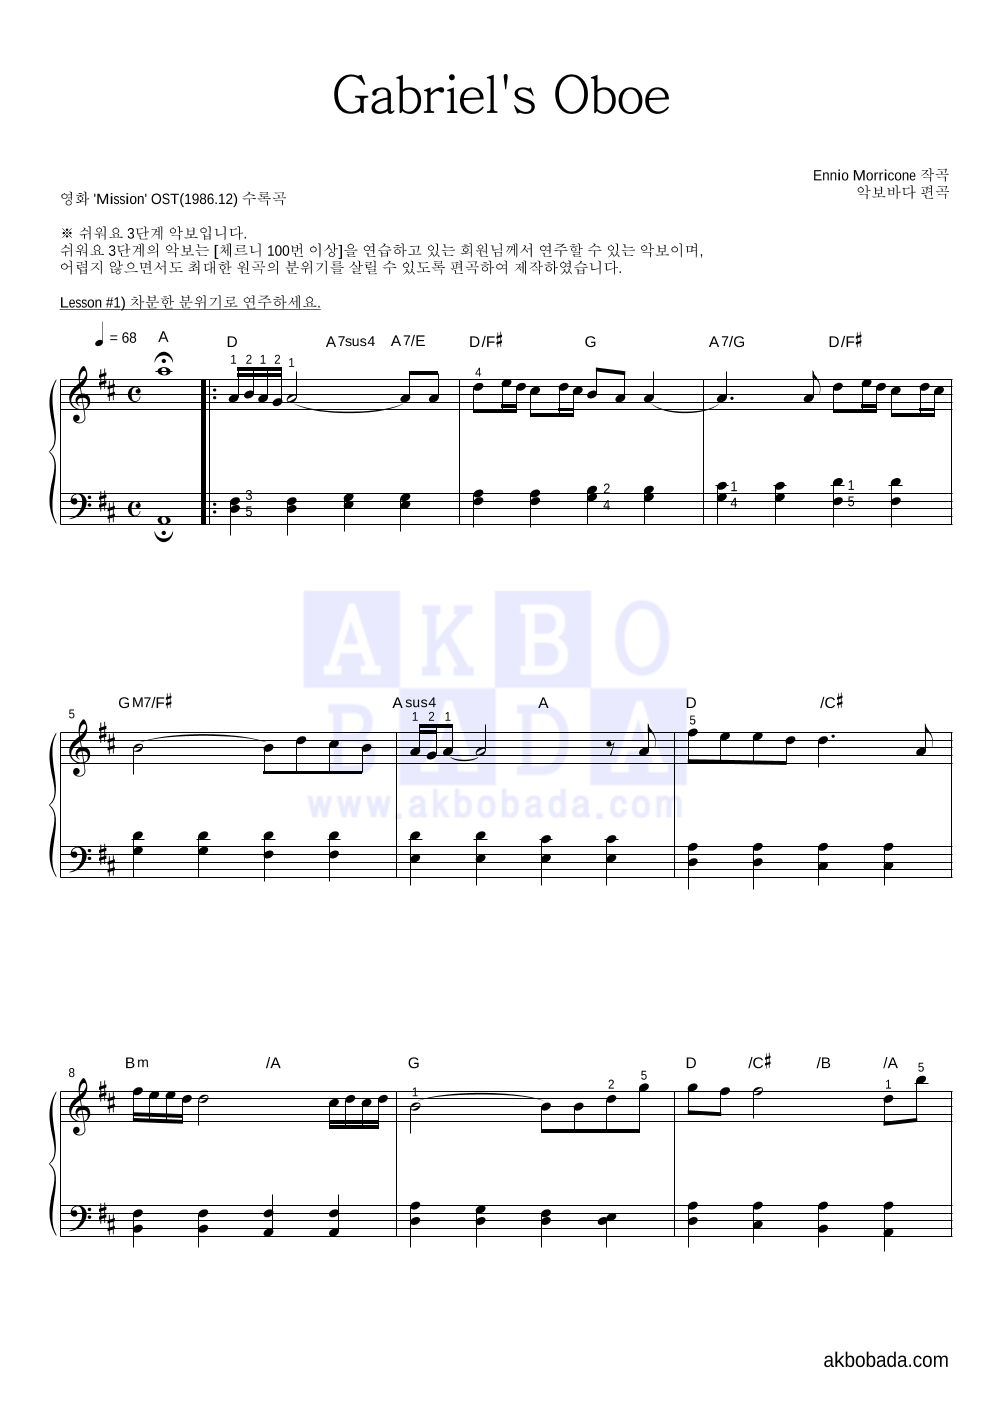 Ennio Morricone - Gabriel's Oboe 피아노2단-쉬워요 악보